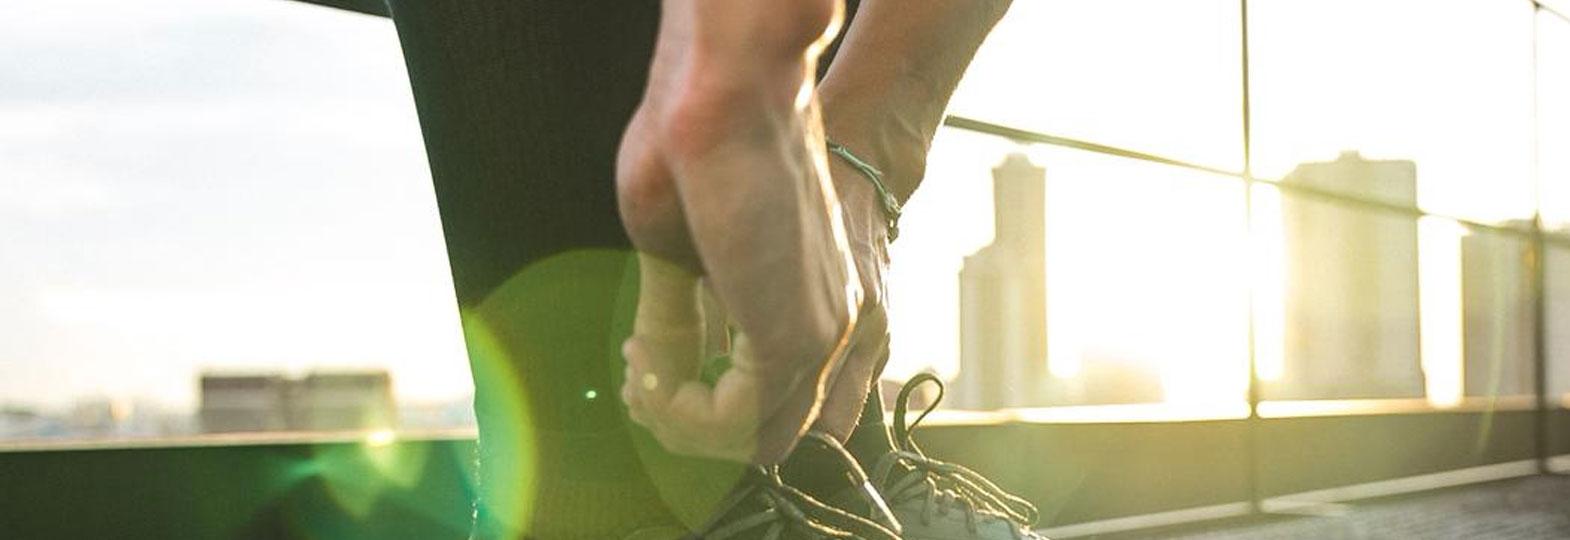 Compression Stockings Nirvana Wellness Centre Brampton